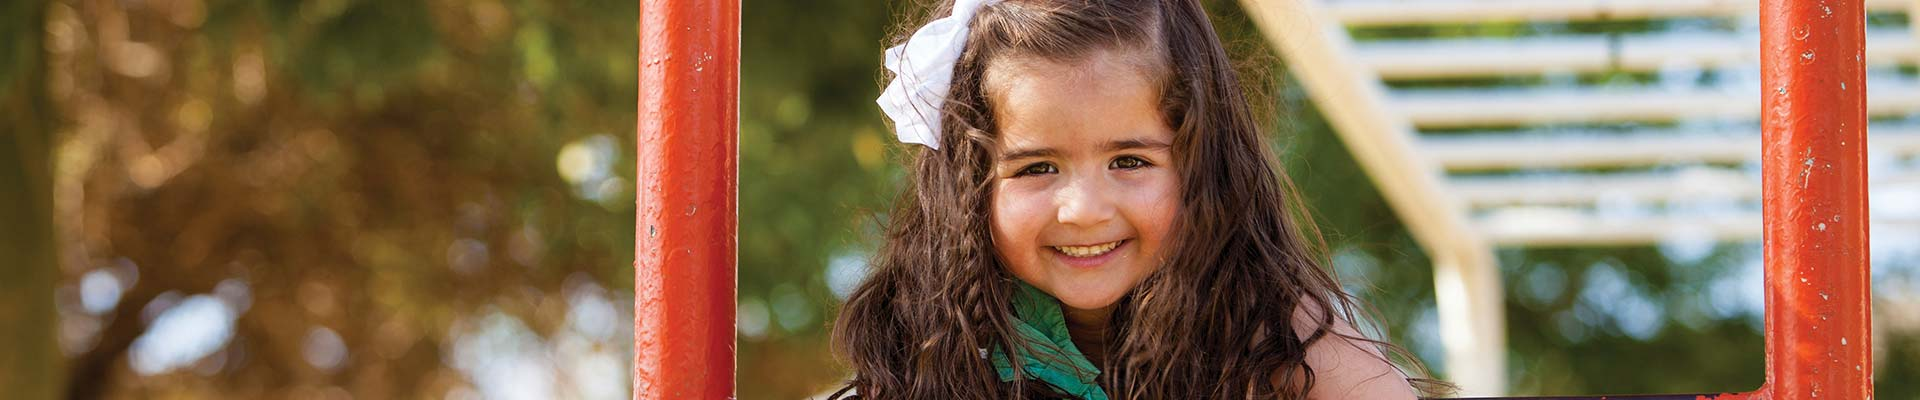 Young Girls Smile Bright Smiles Kids Dentistry Harleysville Doylestown Devon PA